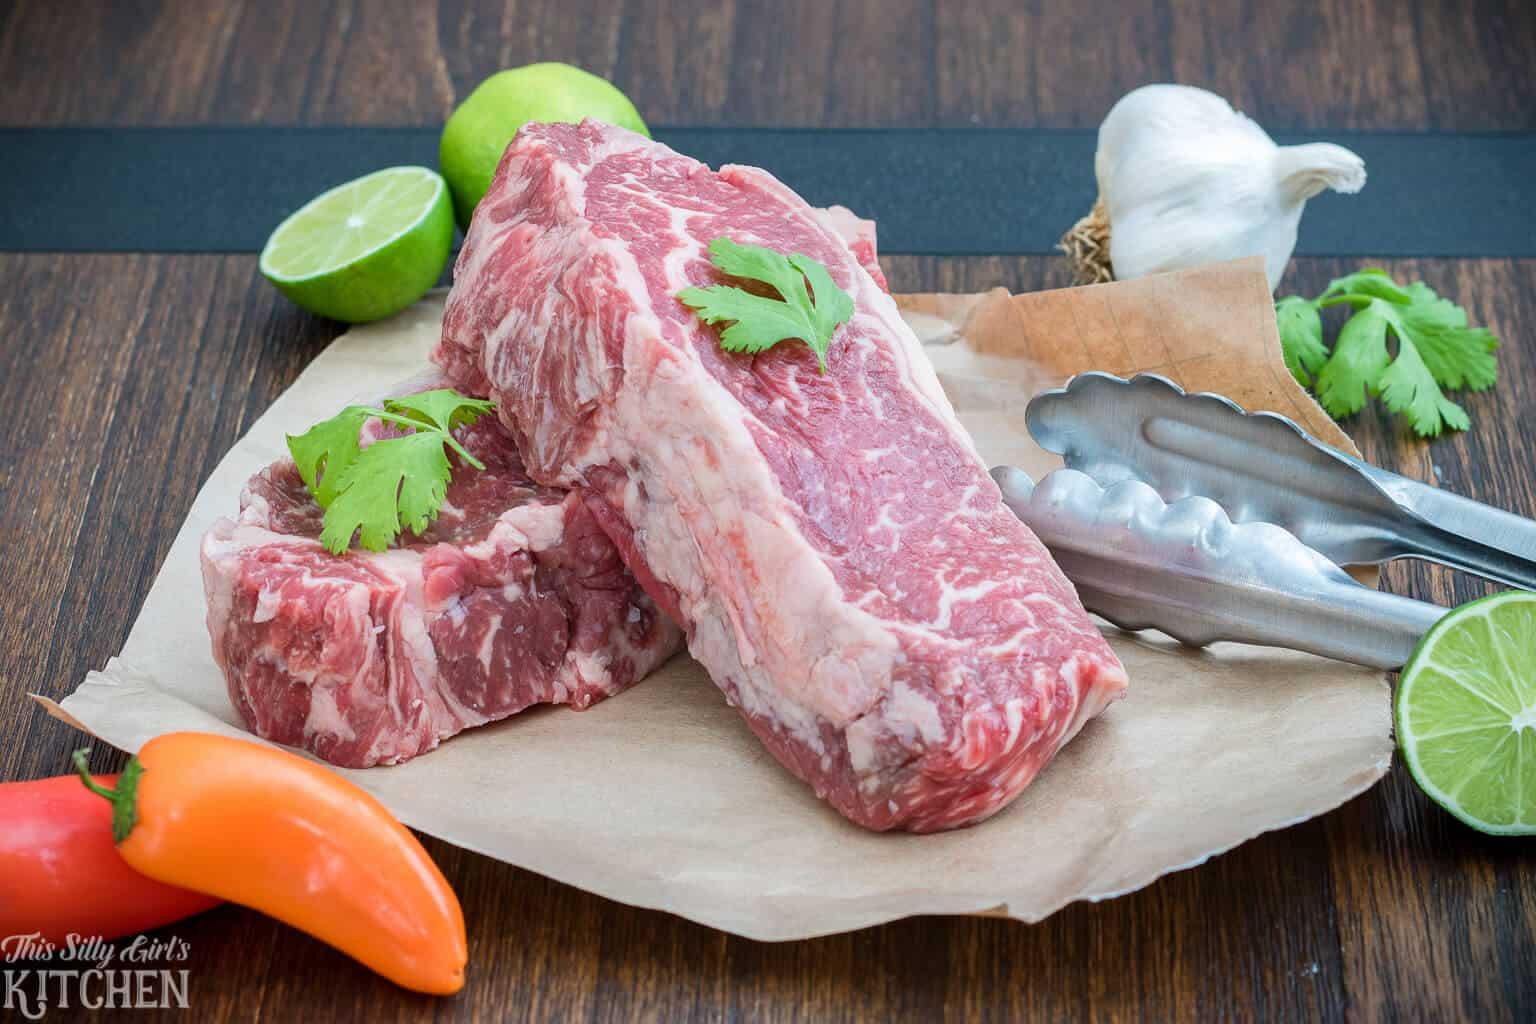 Partial ingredients needed to make Steak Kabobs